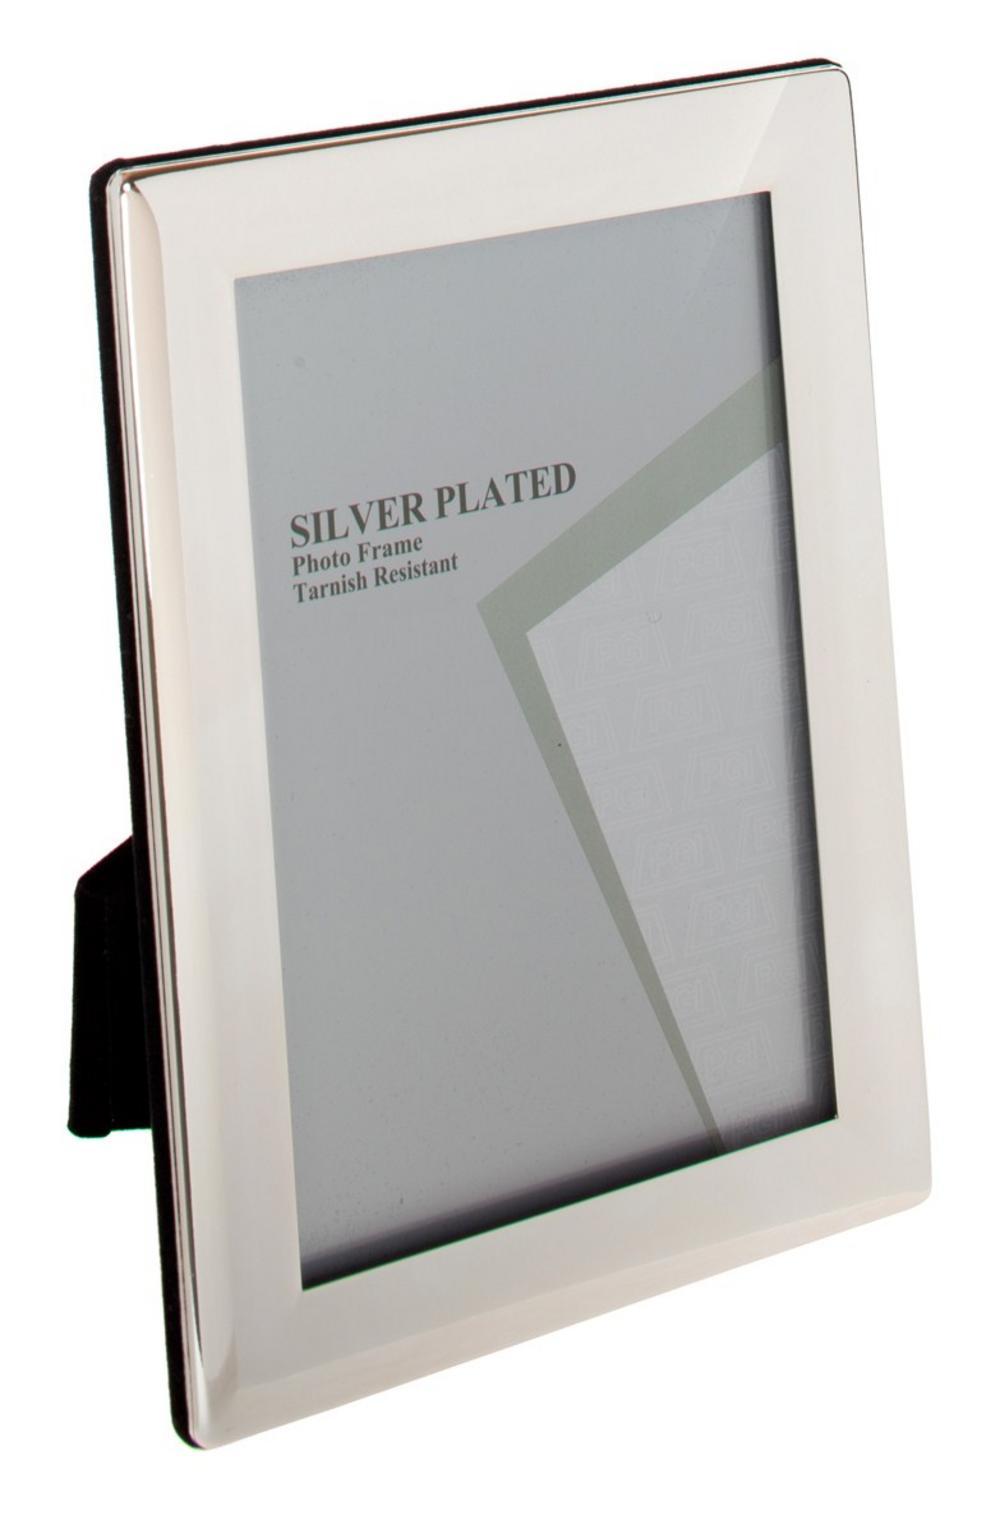 "Unity Silver Plated Thin Edge Photo Frame 12"" x 10"""